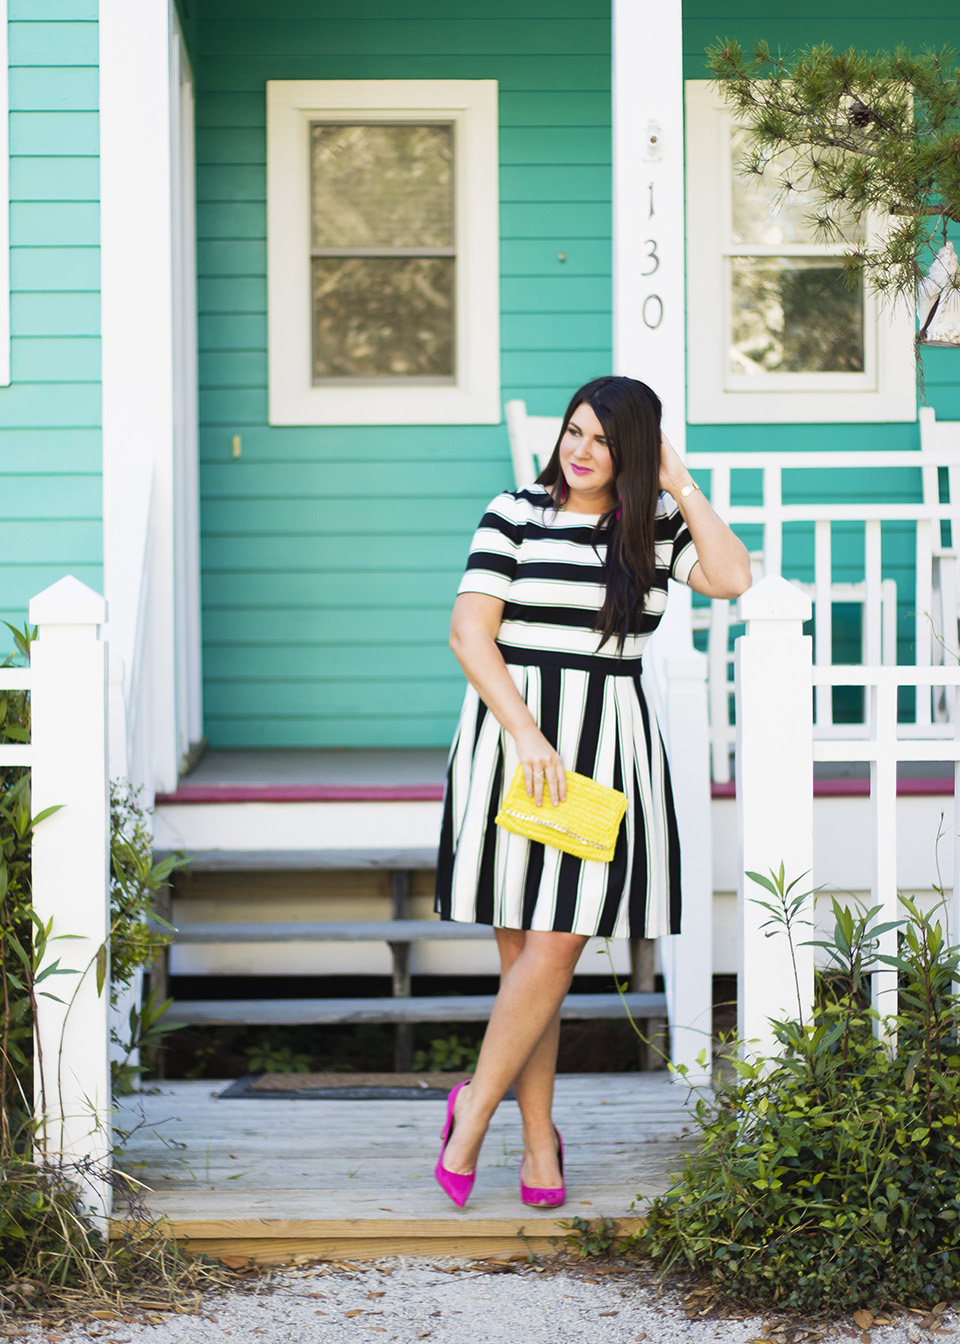 BW Ladylike Stripes 30A Street Style 8